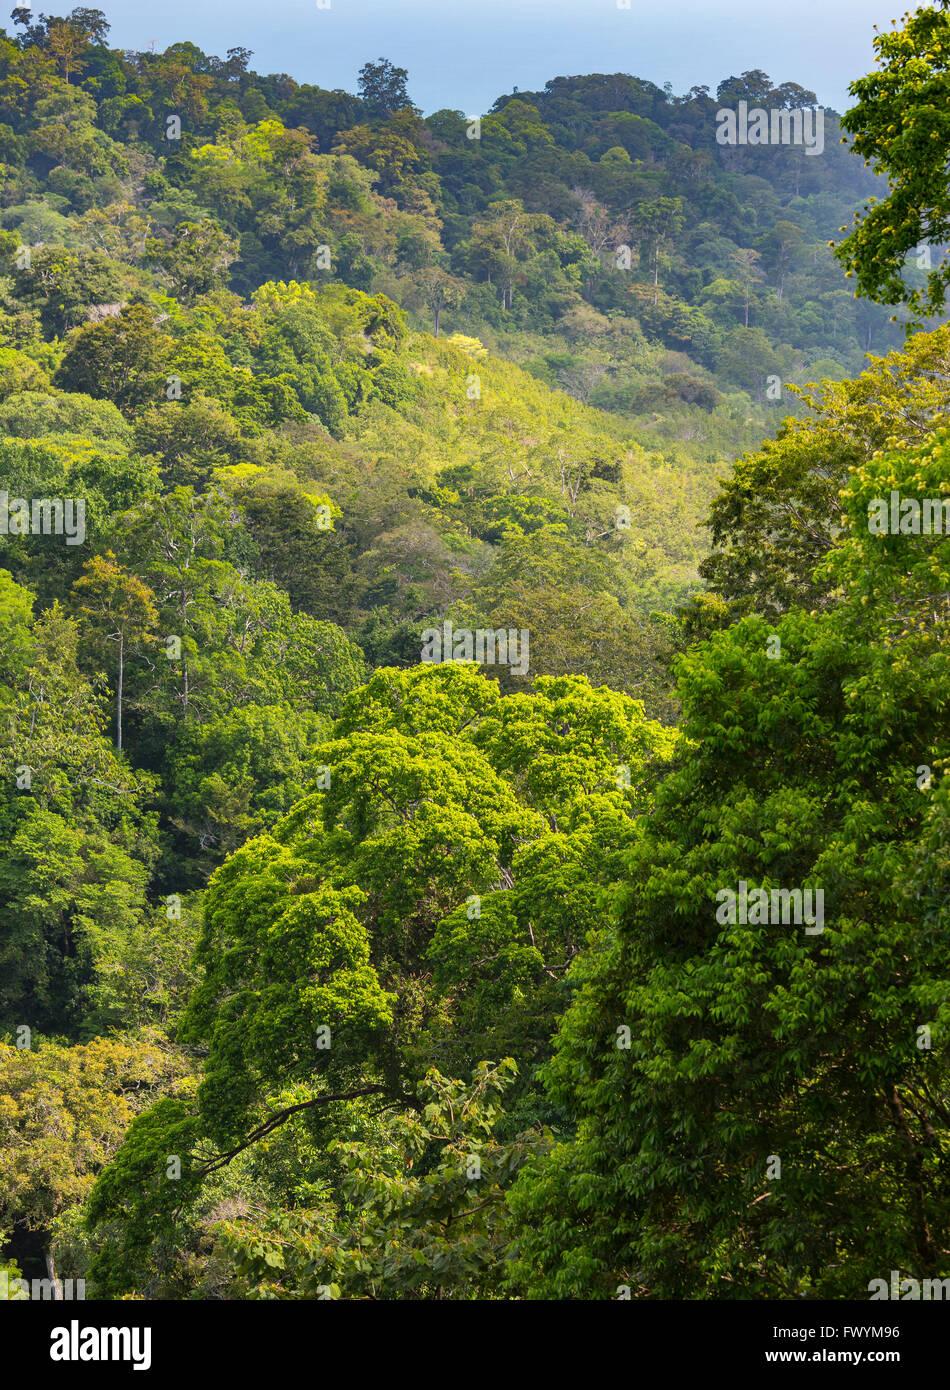 OSA PENINSULA, COSTA RICA - Trees in primary rain forest. - Stock Image